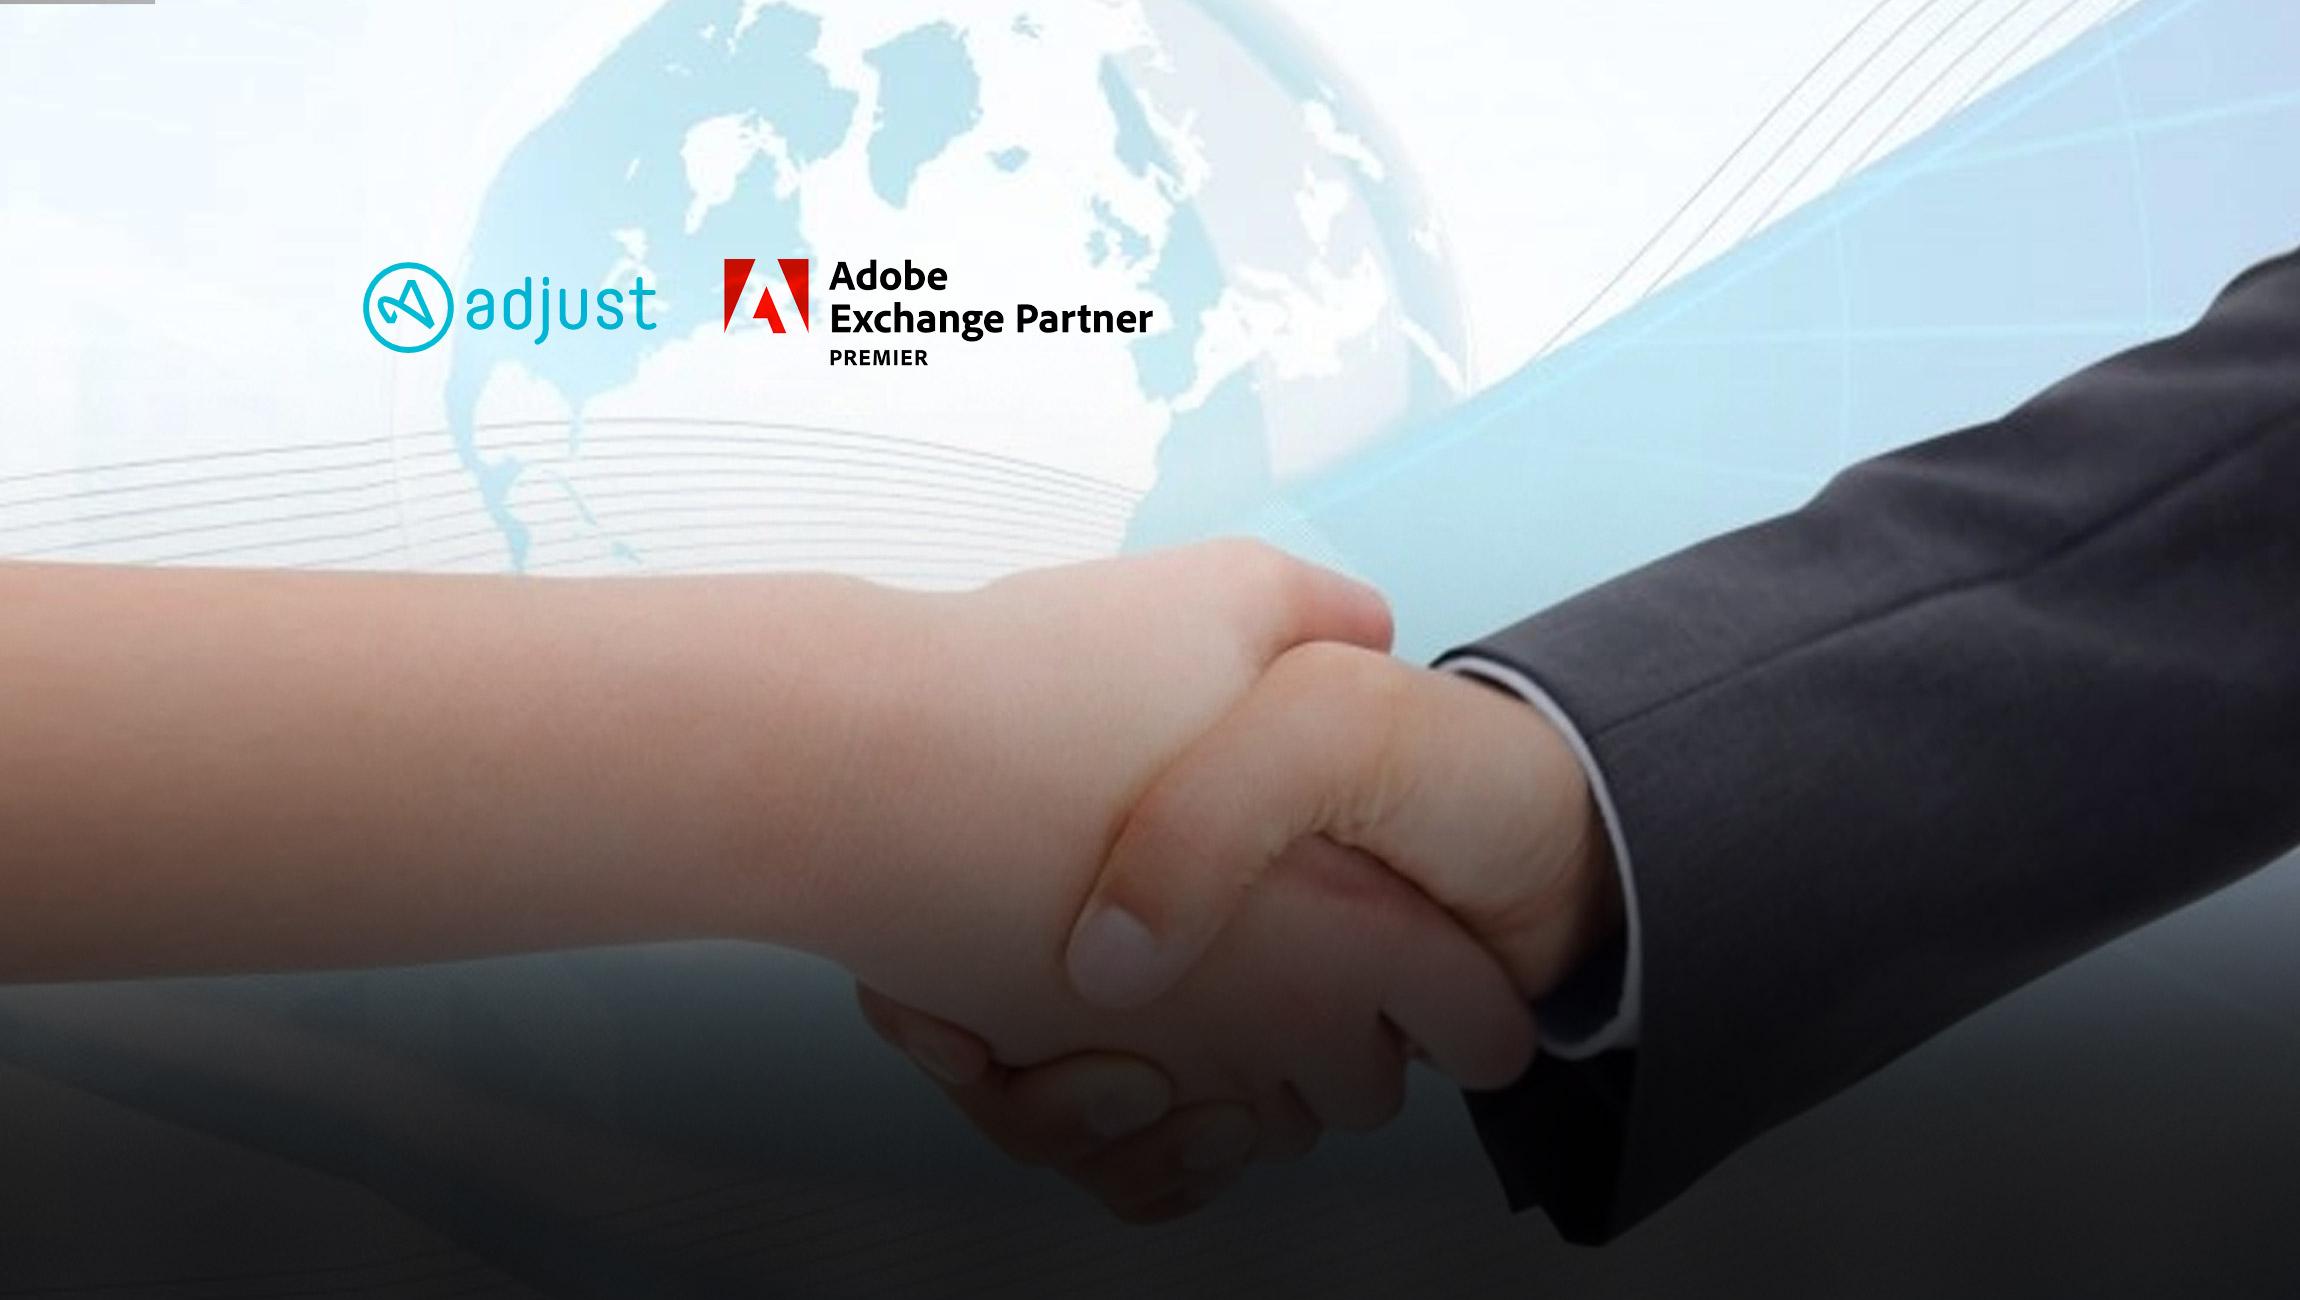 Adjust Joins Adobe Exchange Partner Program to Enhance App Marketing Measurement, Fraud Prevention and Reporting for Digital Advertisers